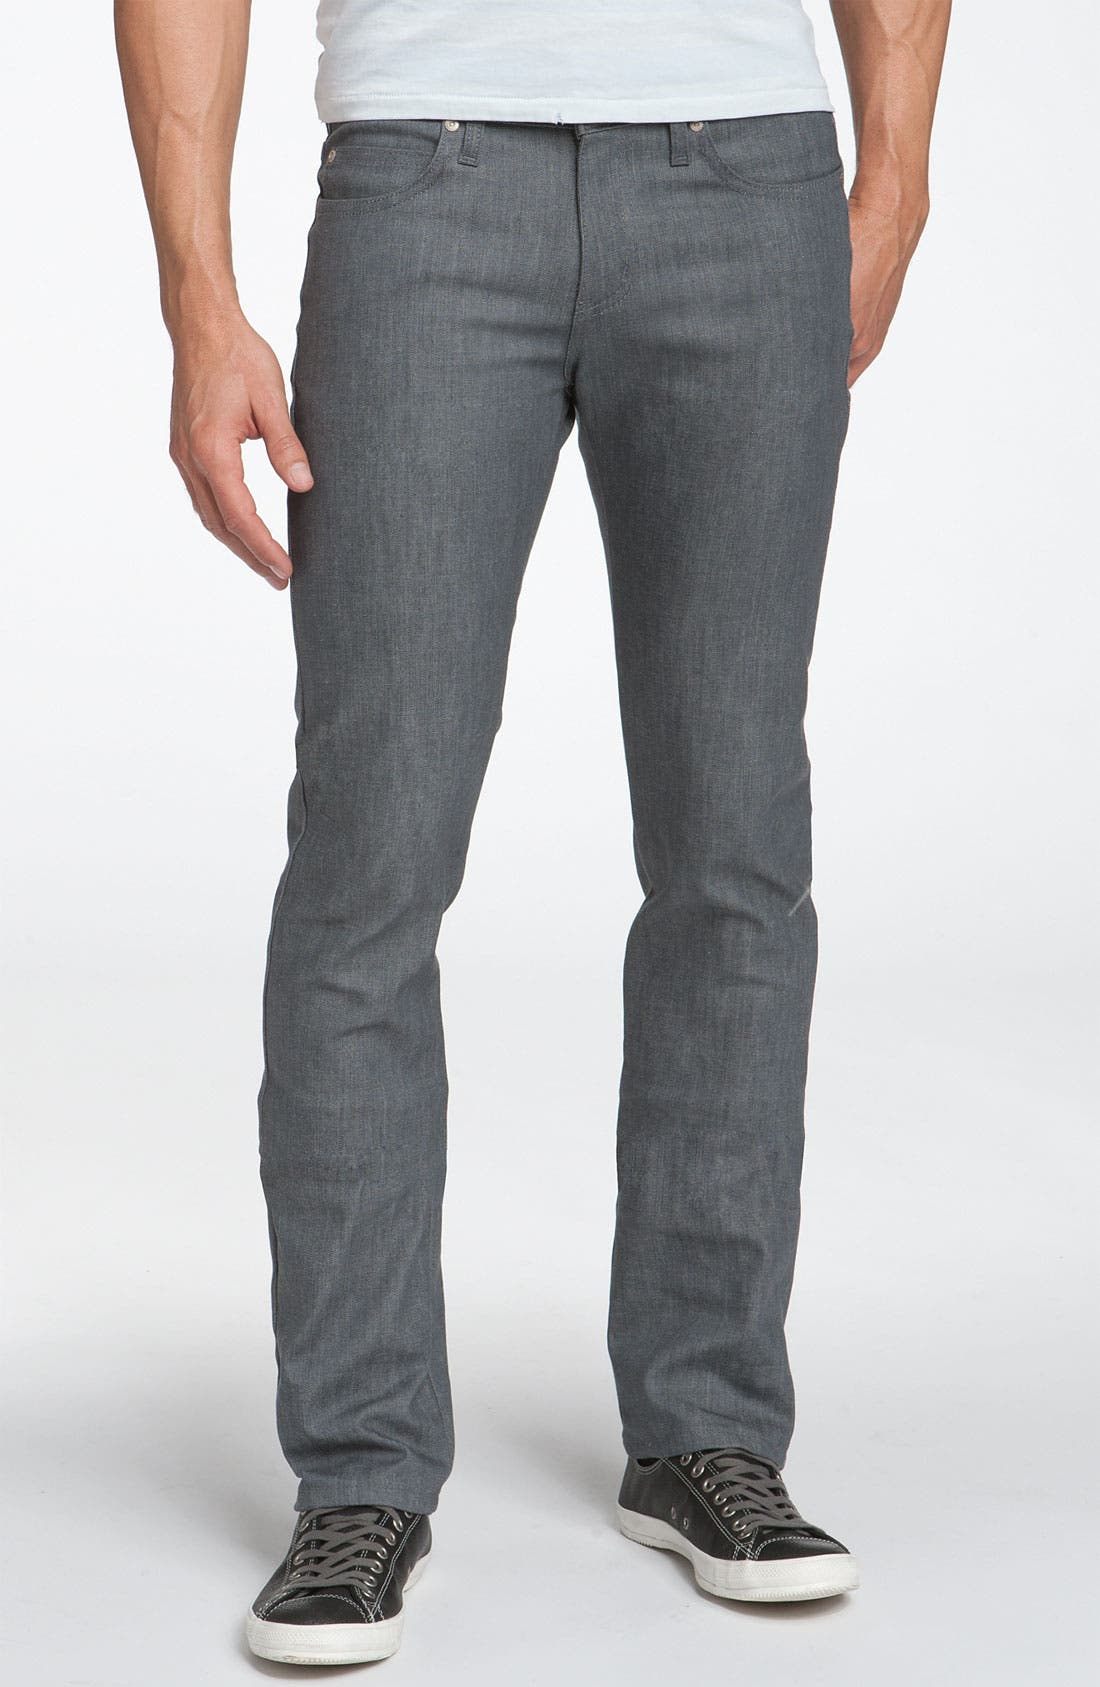 Alternate Image 1 Selected - Naked & Famous Denim 'Skinny Guy' Skinny Fit Jeans (Grey Stretch Wash)